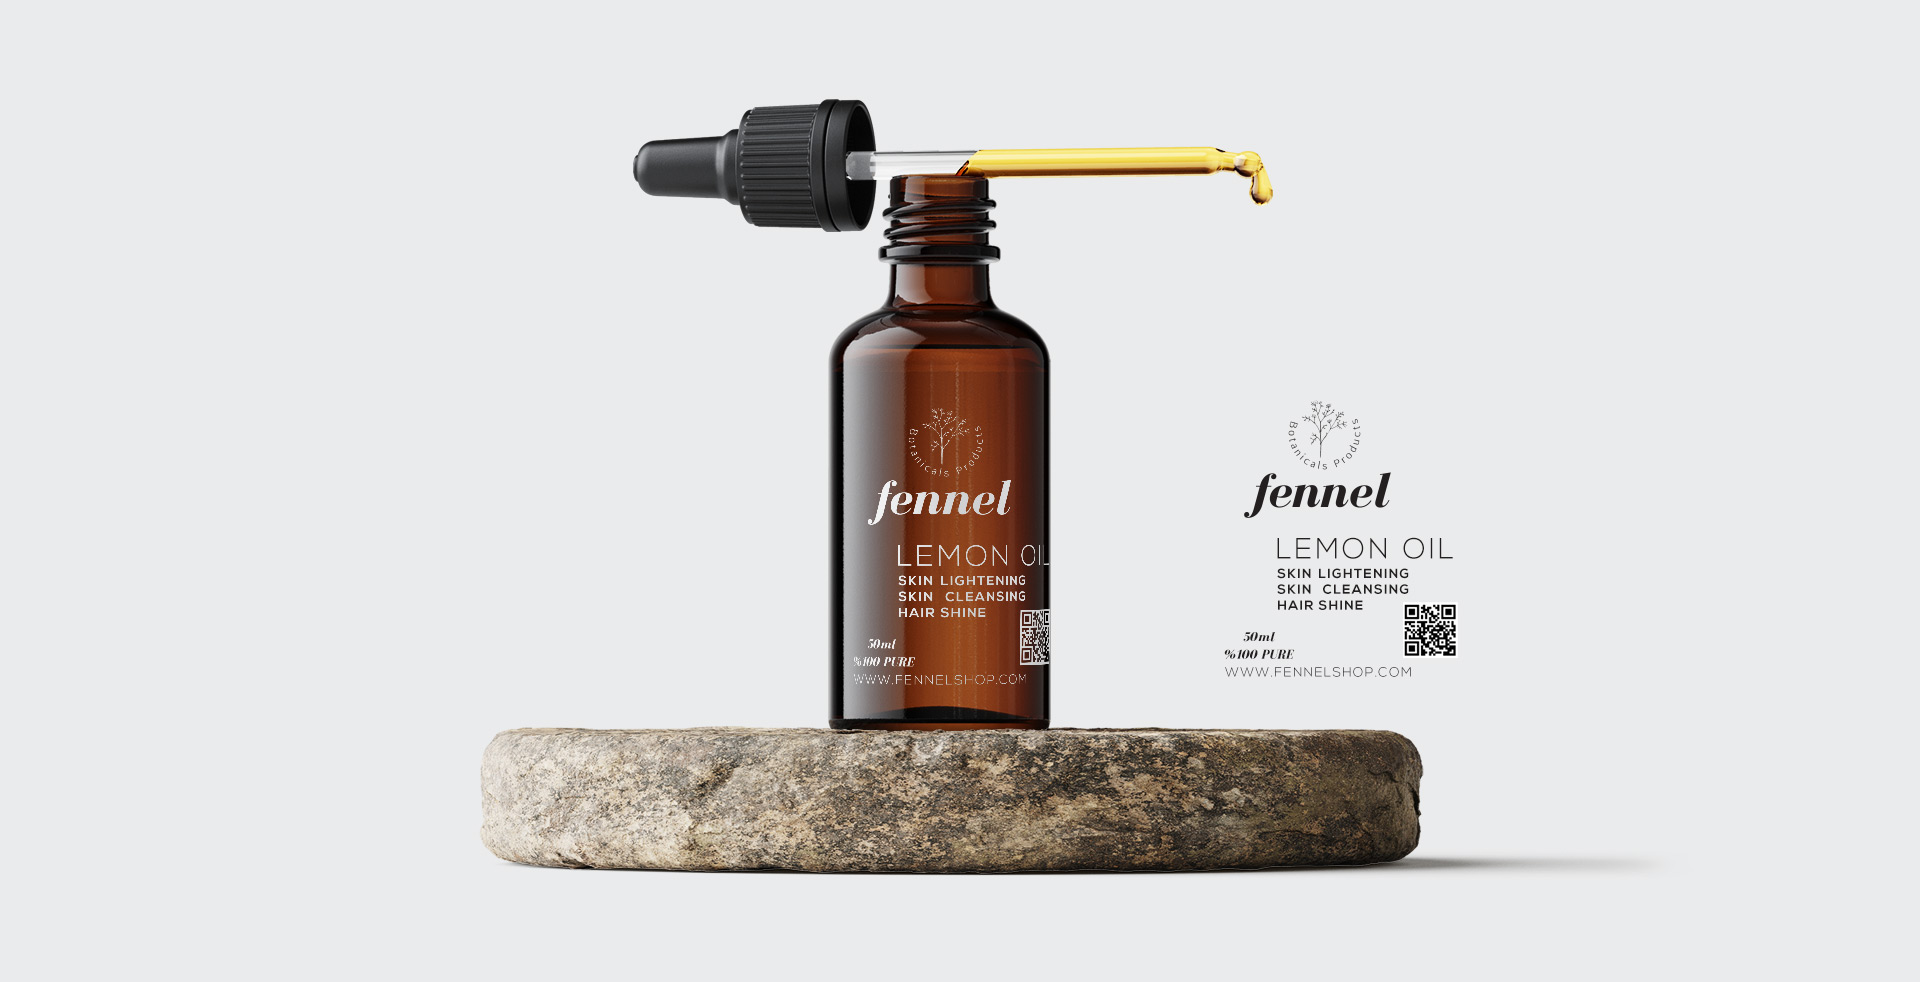 fennel logo design lemon oil dropper bottle by vazirstudio.com